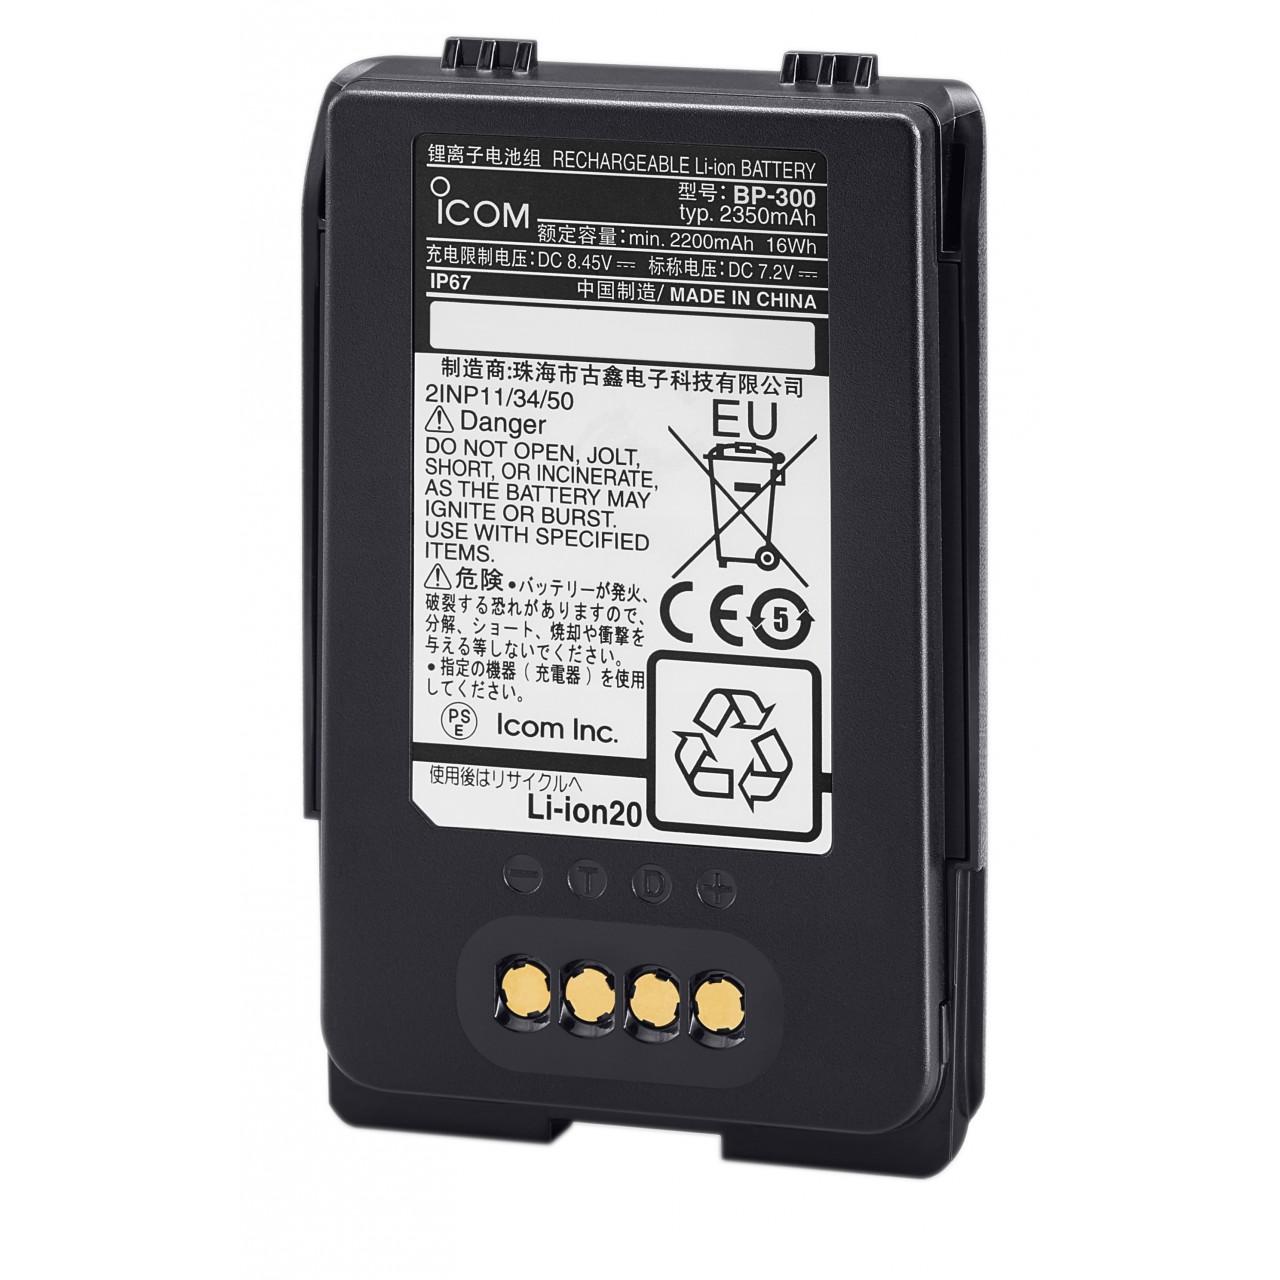 BP-300 Batteries - ICOM